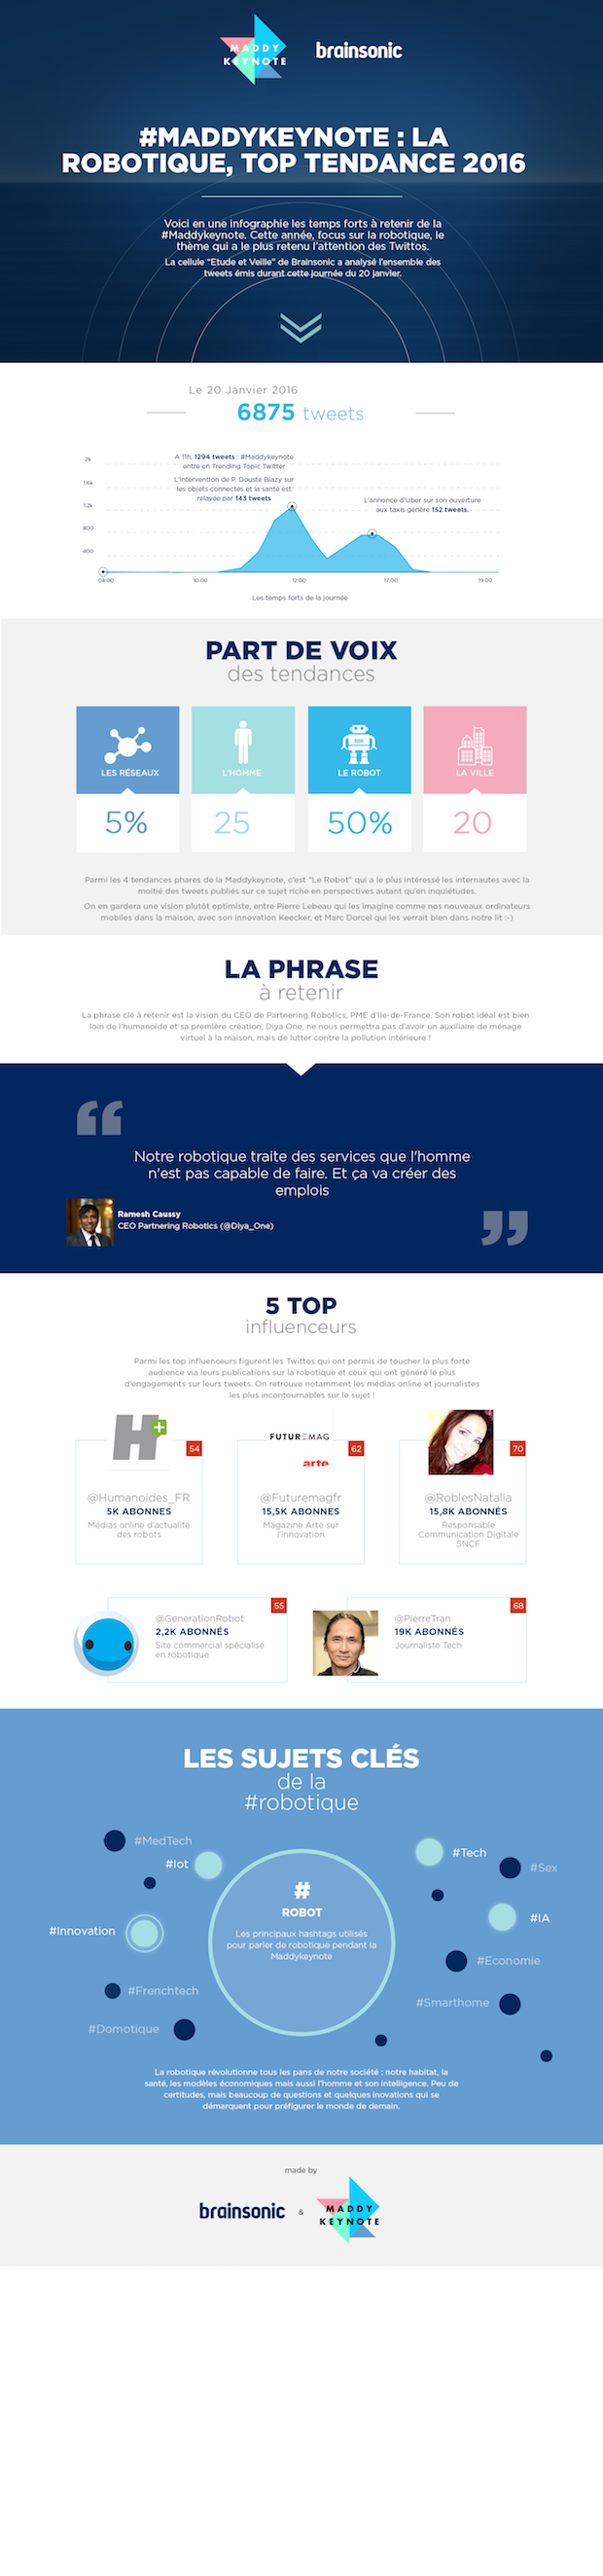 Maddy Keynote Infographie